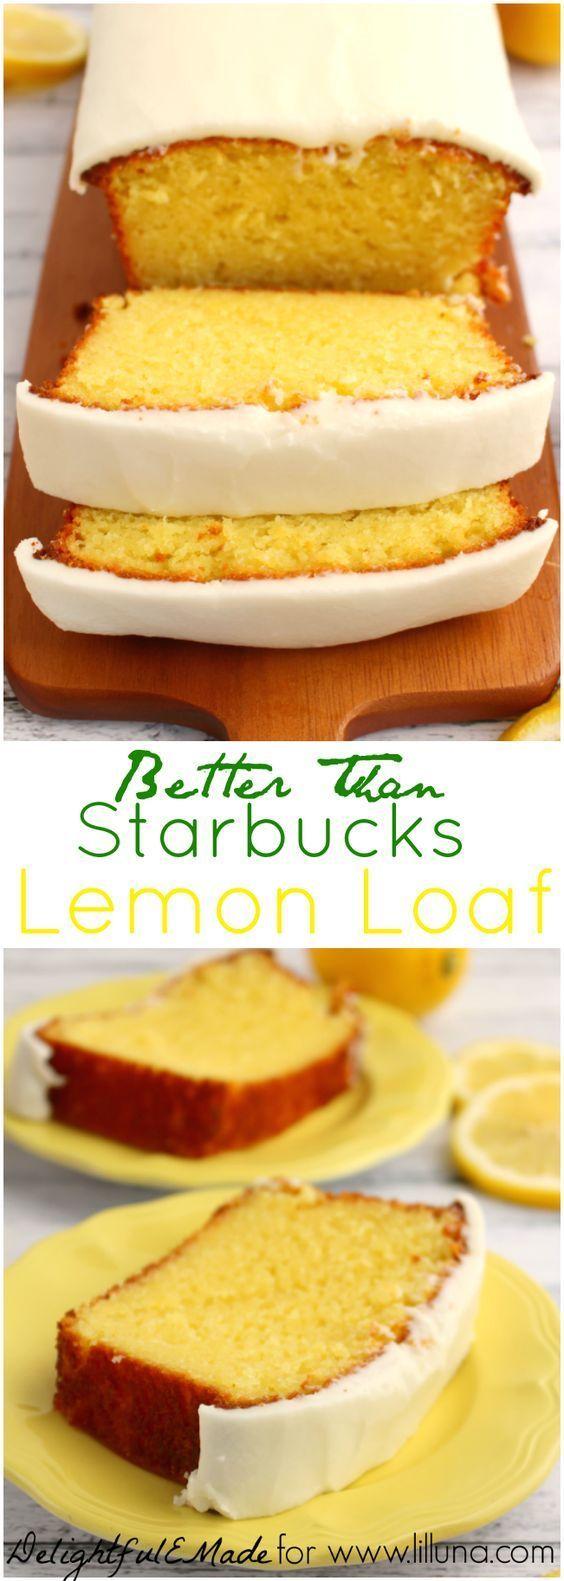 Kuchen Starbucks lemon loaf copycat